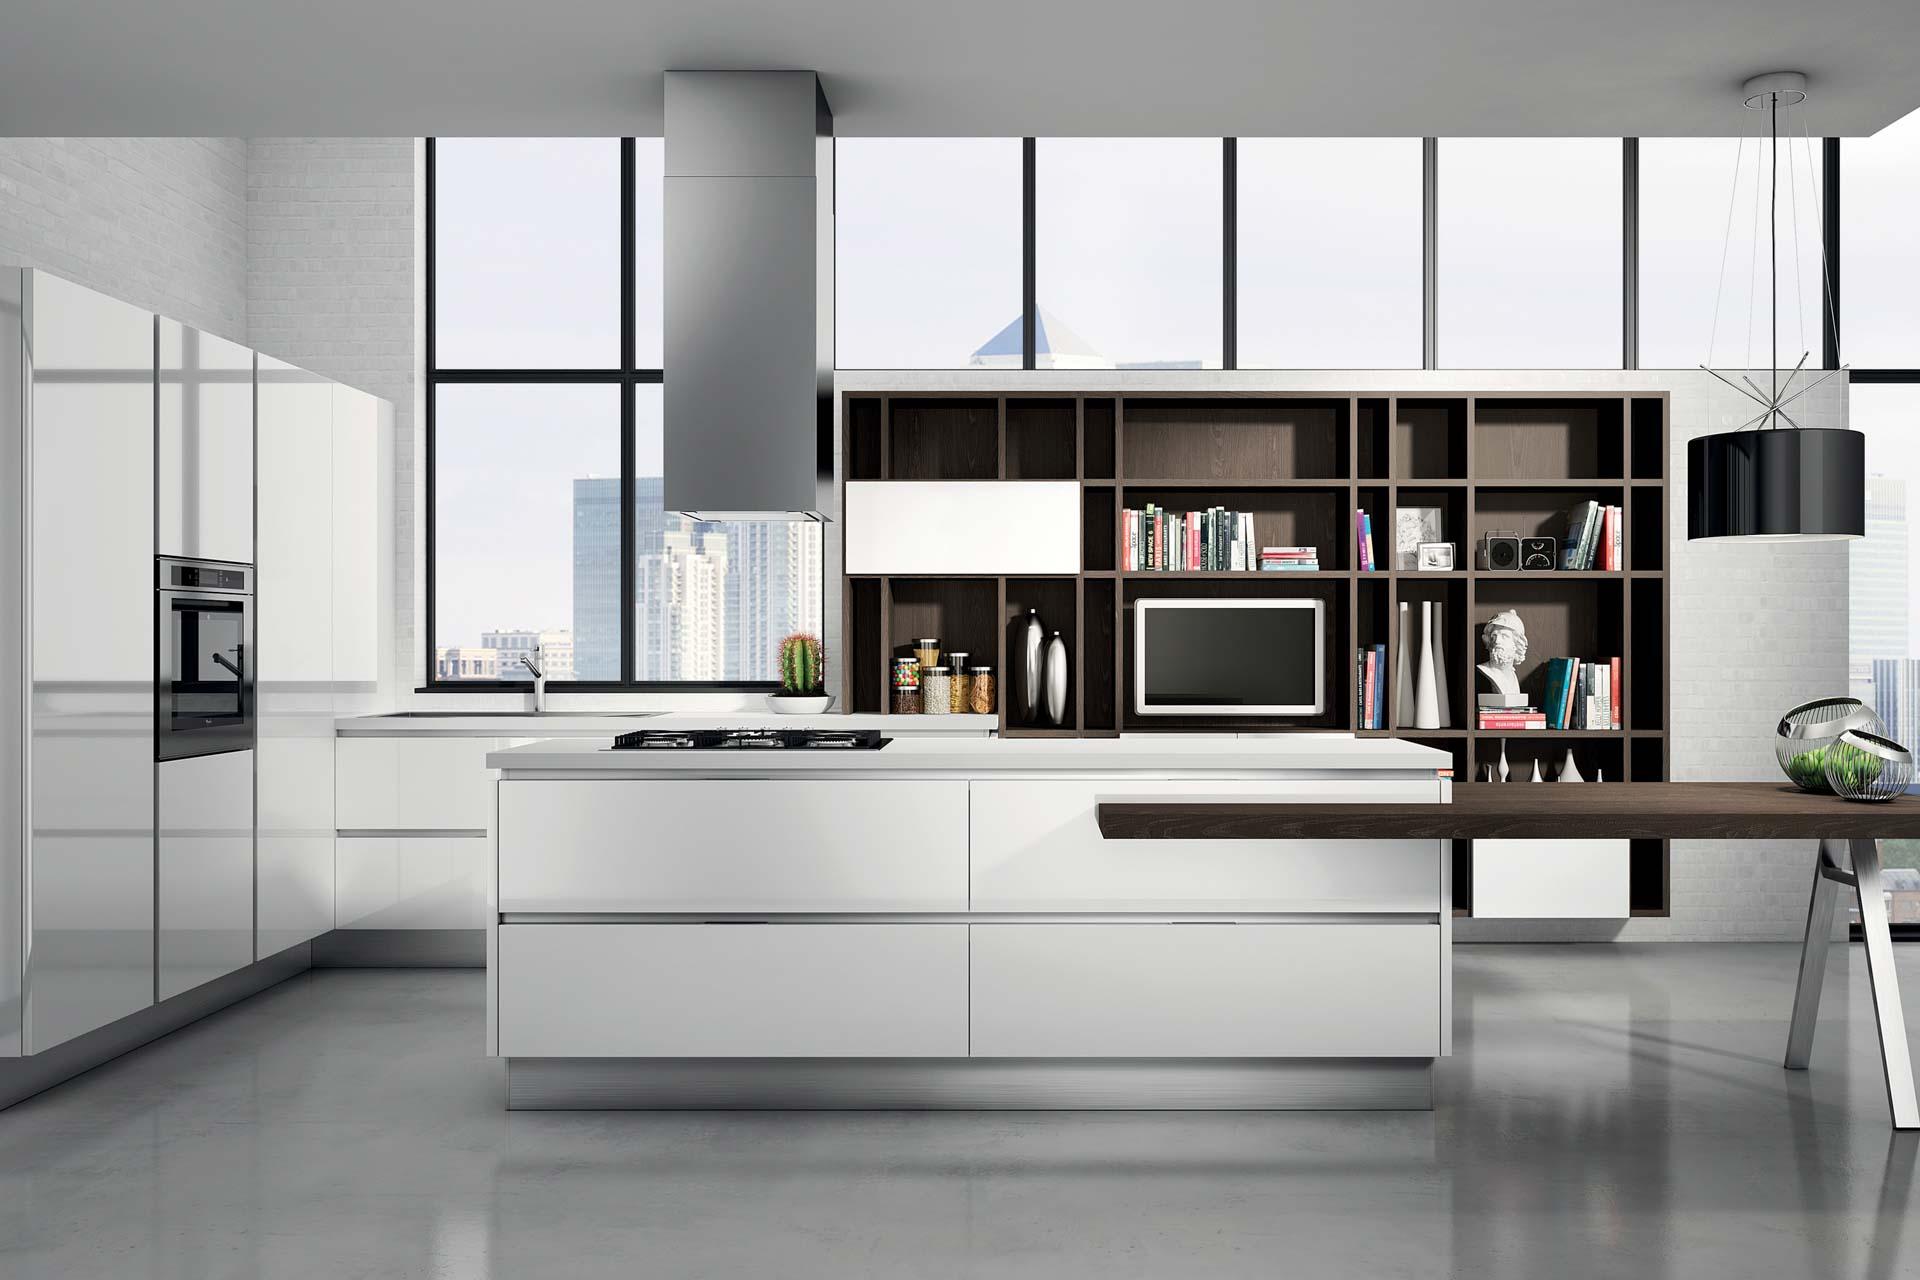 Living Room Storage Cabinets Bella European Cabinets